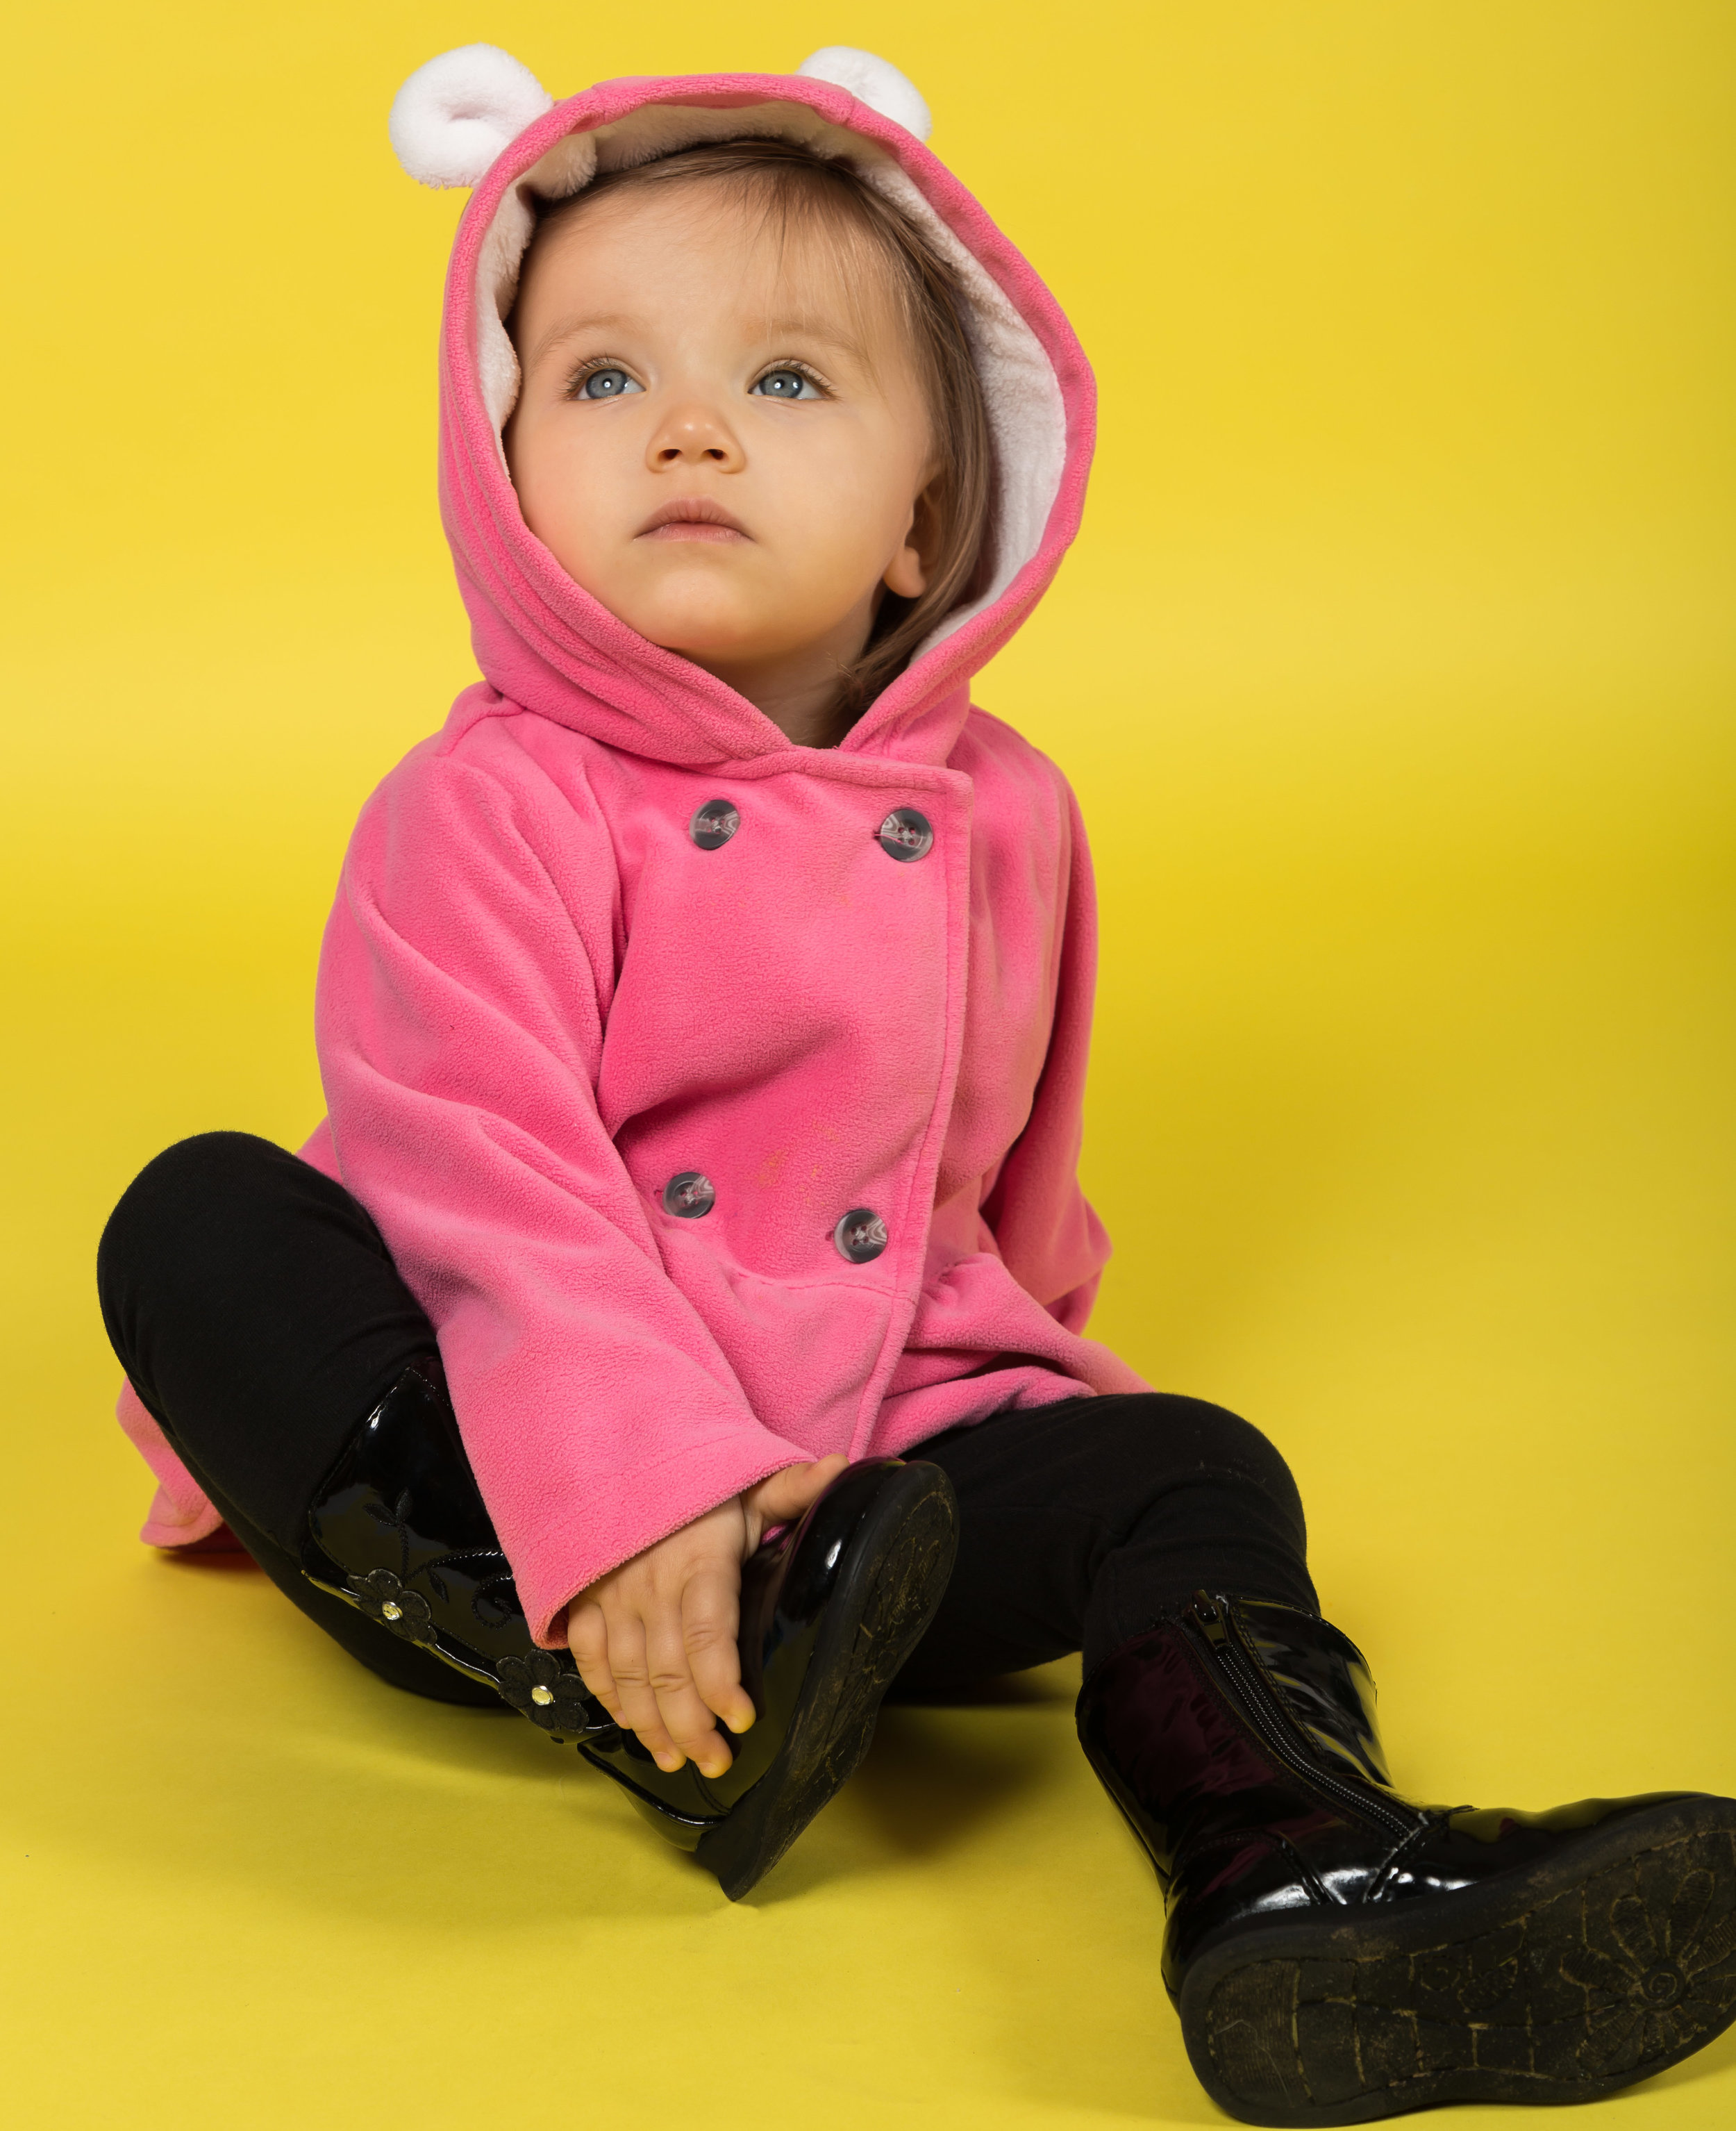 portland-or-vancouver-wa-baby-toddler-portrait-portfolio-photos-michael-verity-photography